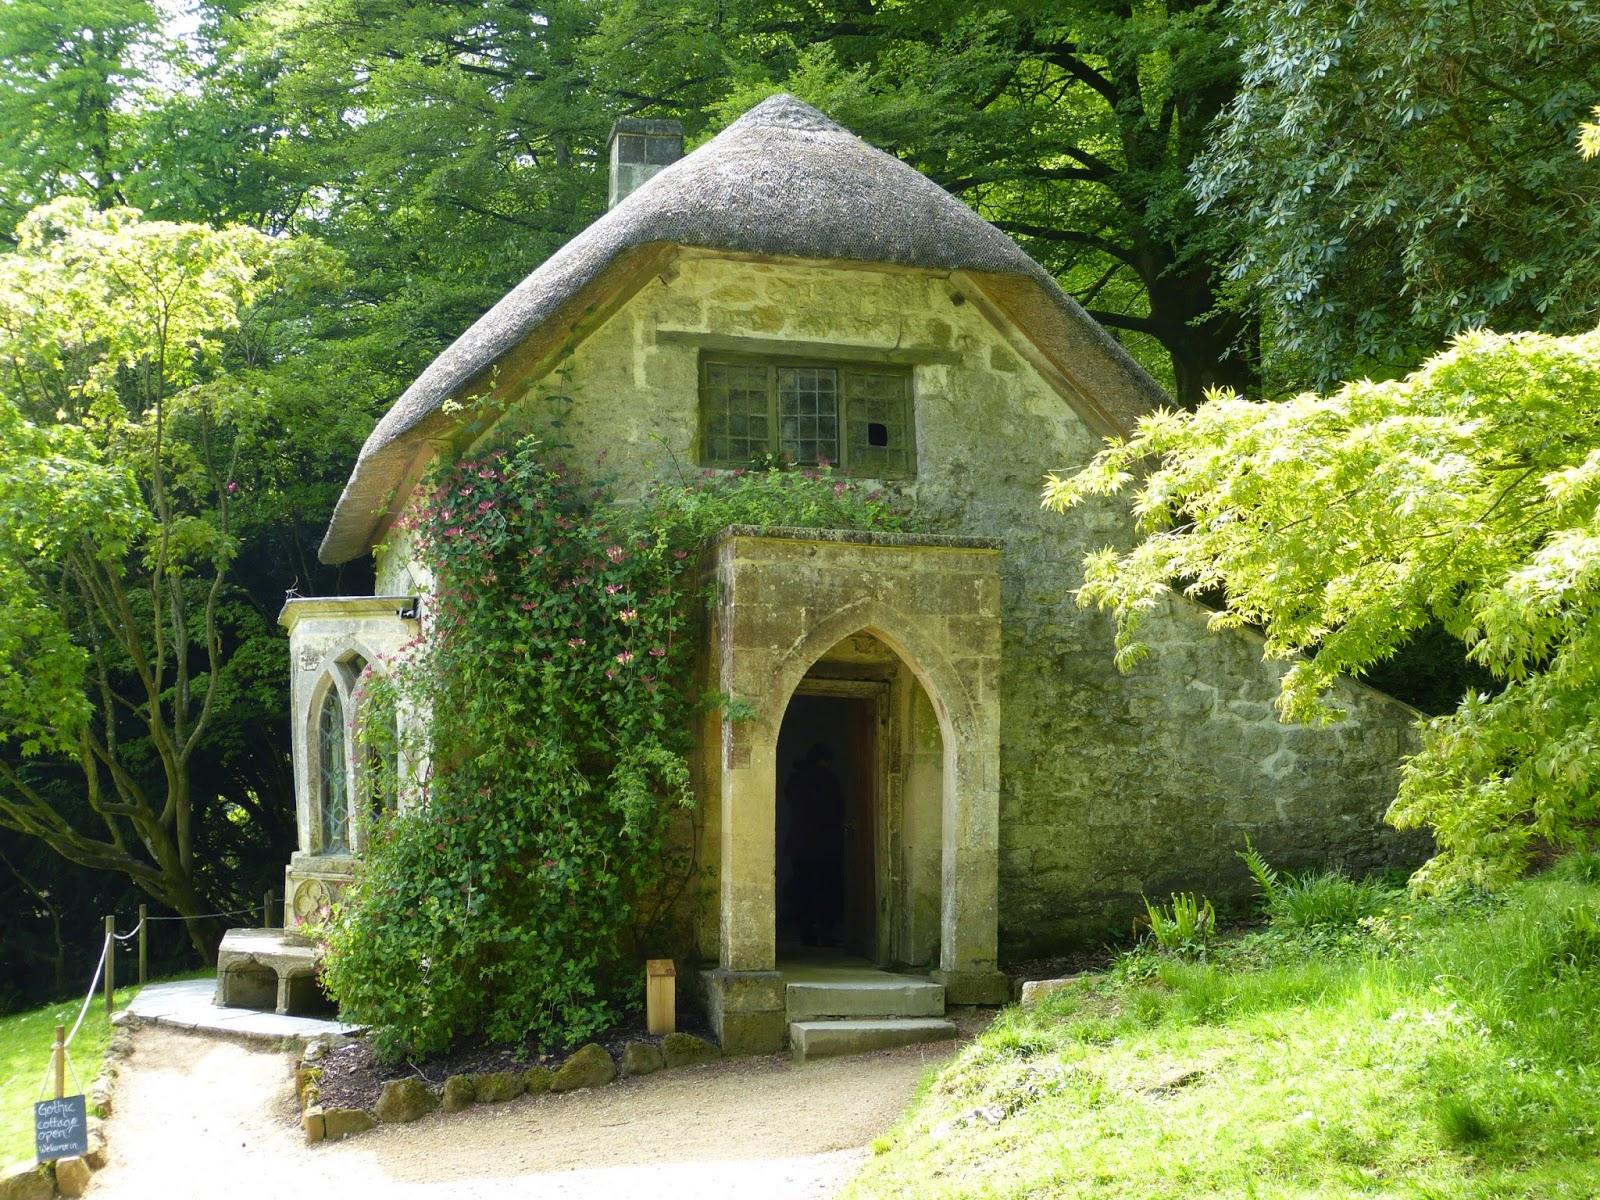 Gothic cottage, Stourhead